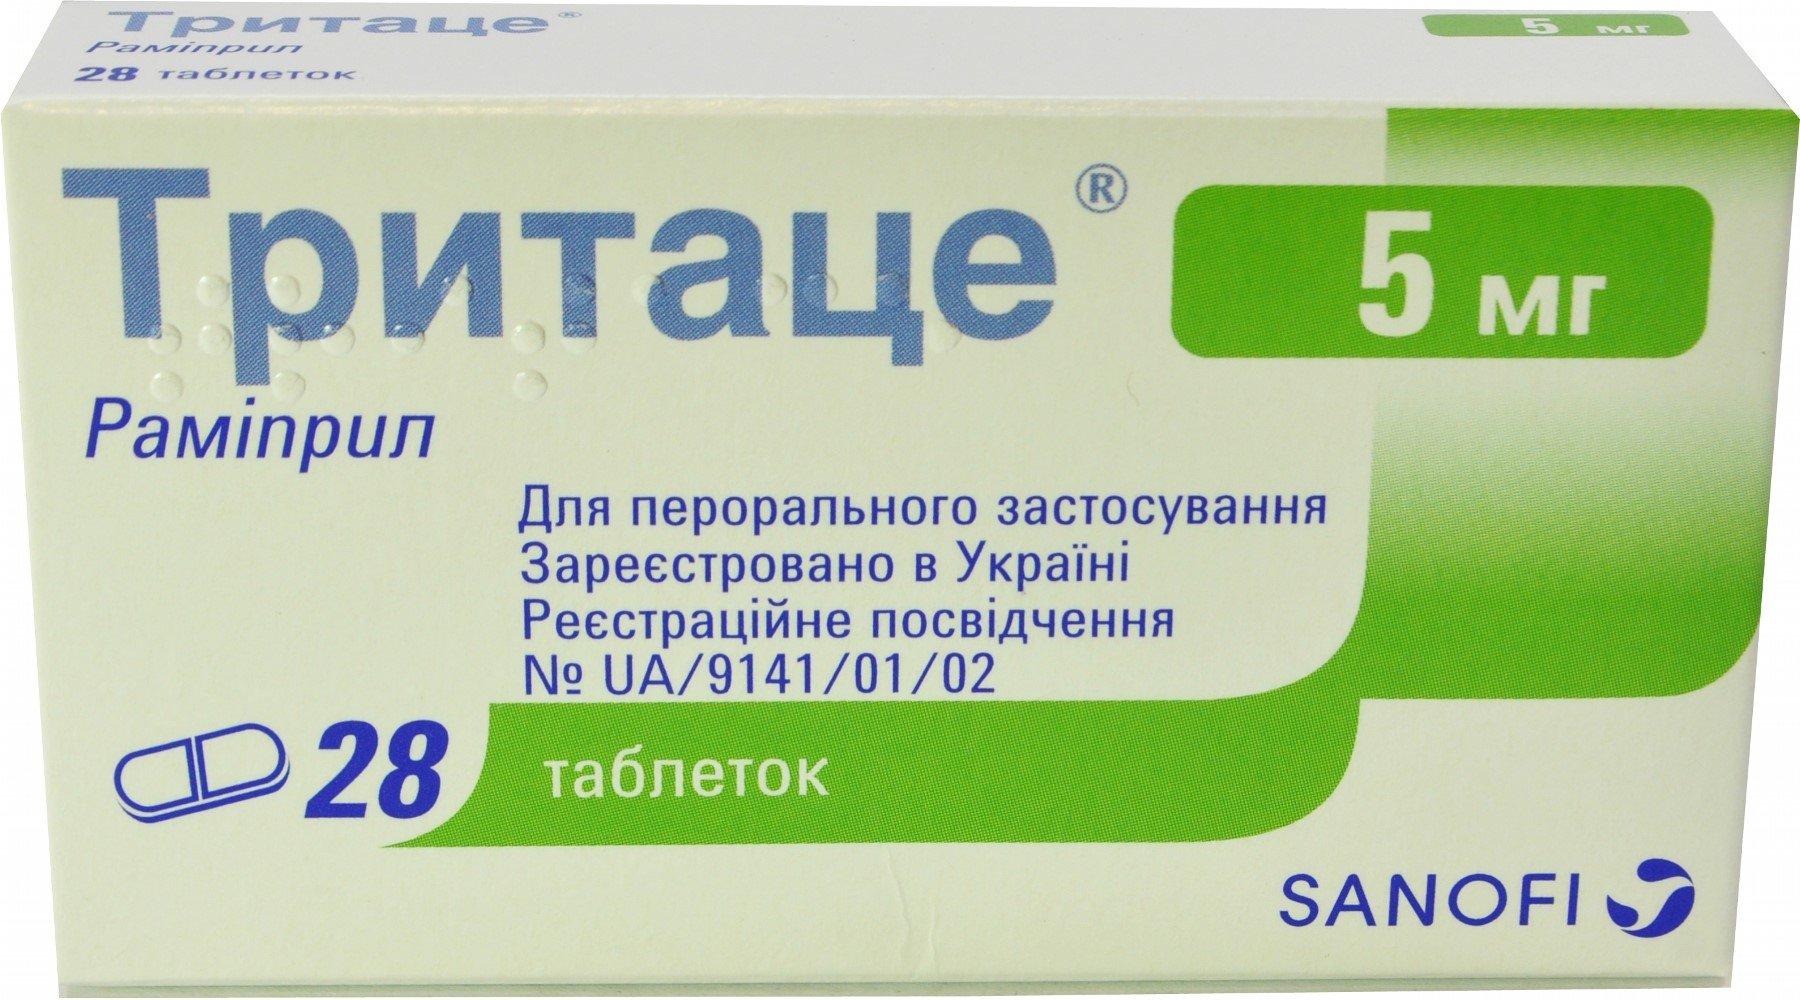 Состав и форма выпуска препарата Тритаце